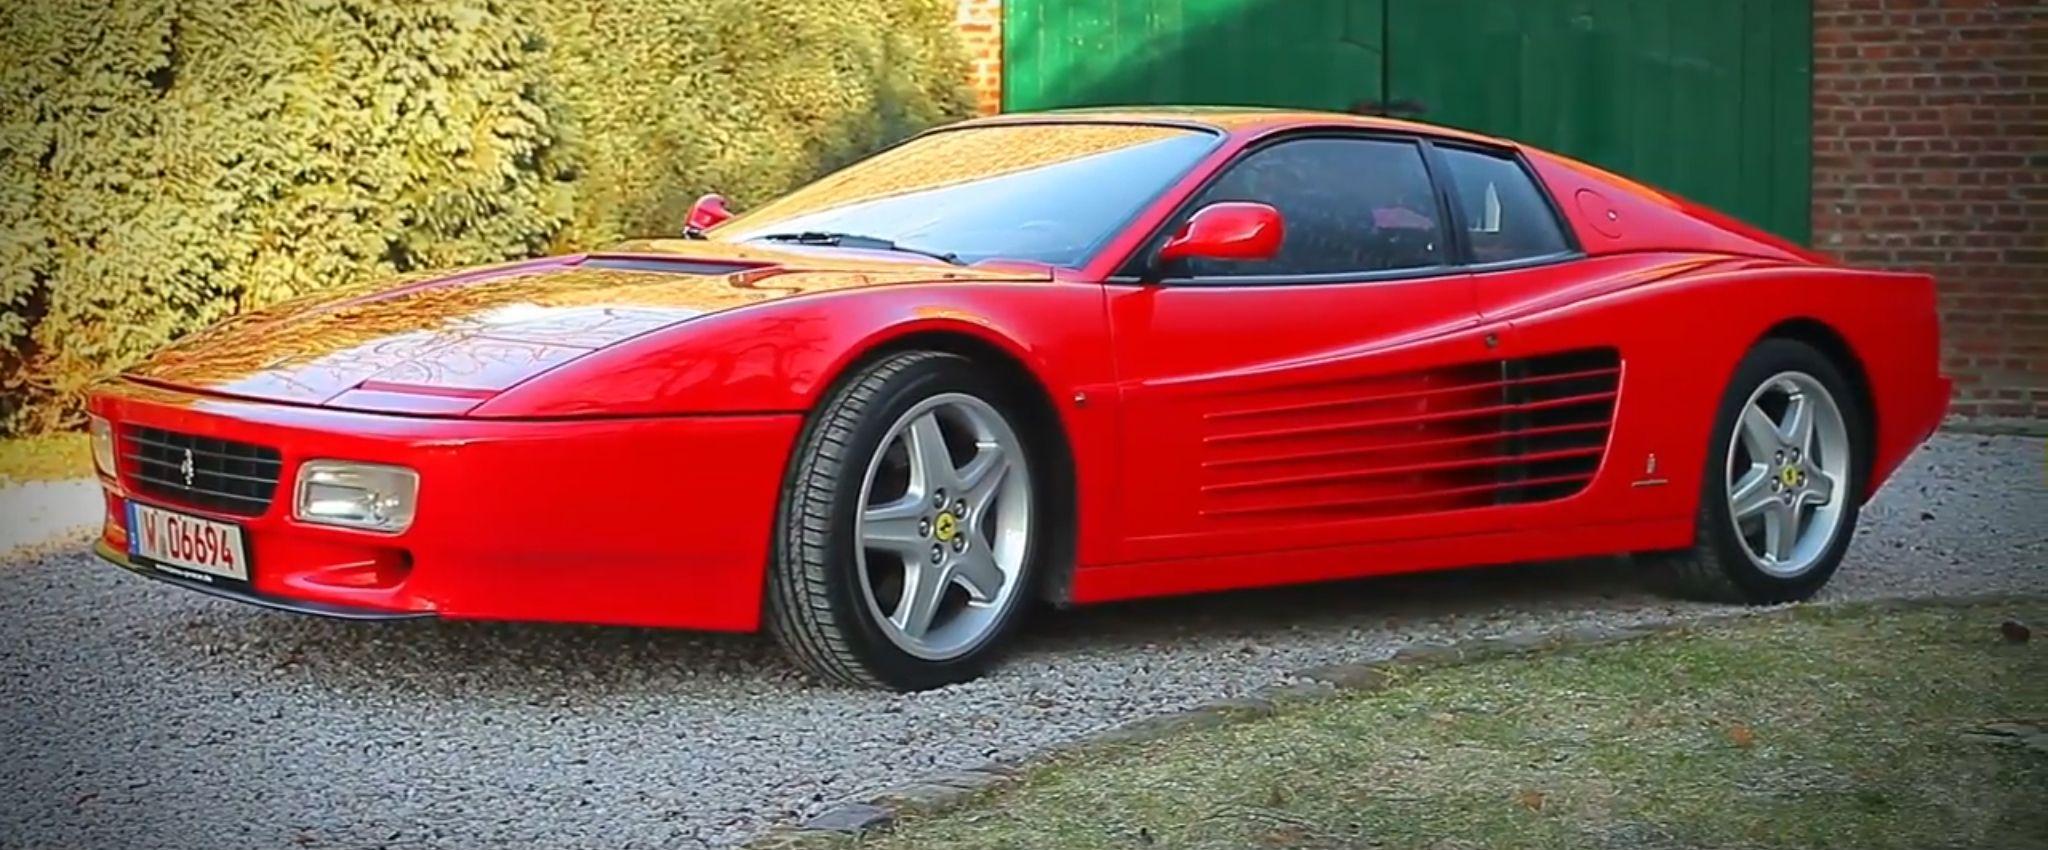 1992 Ferrari 512 Tr Ferrari 348 Ferrari Ferrari Testarossa